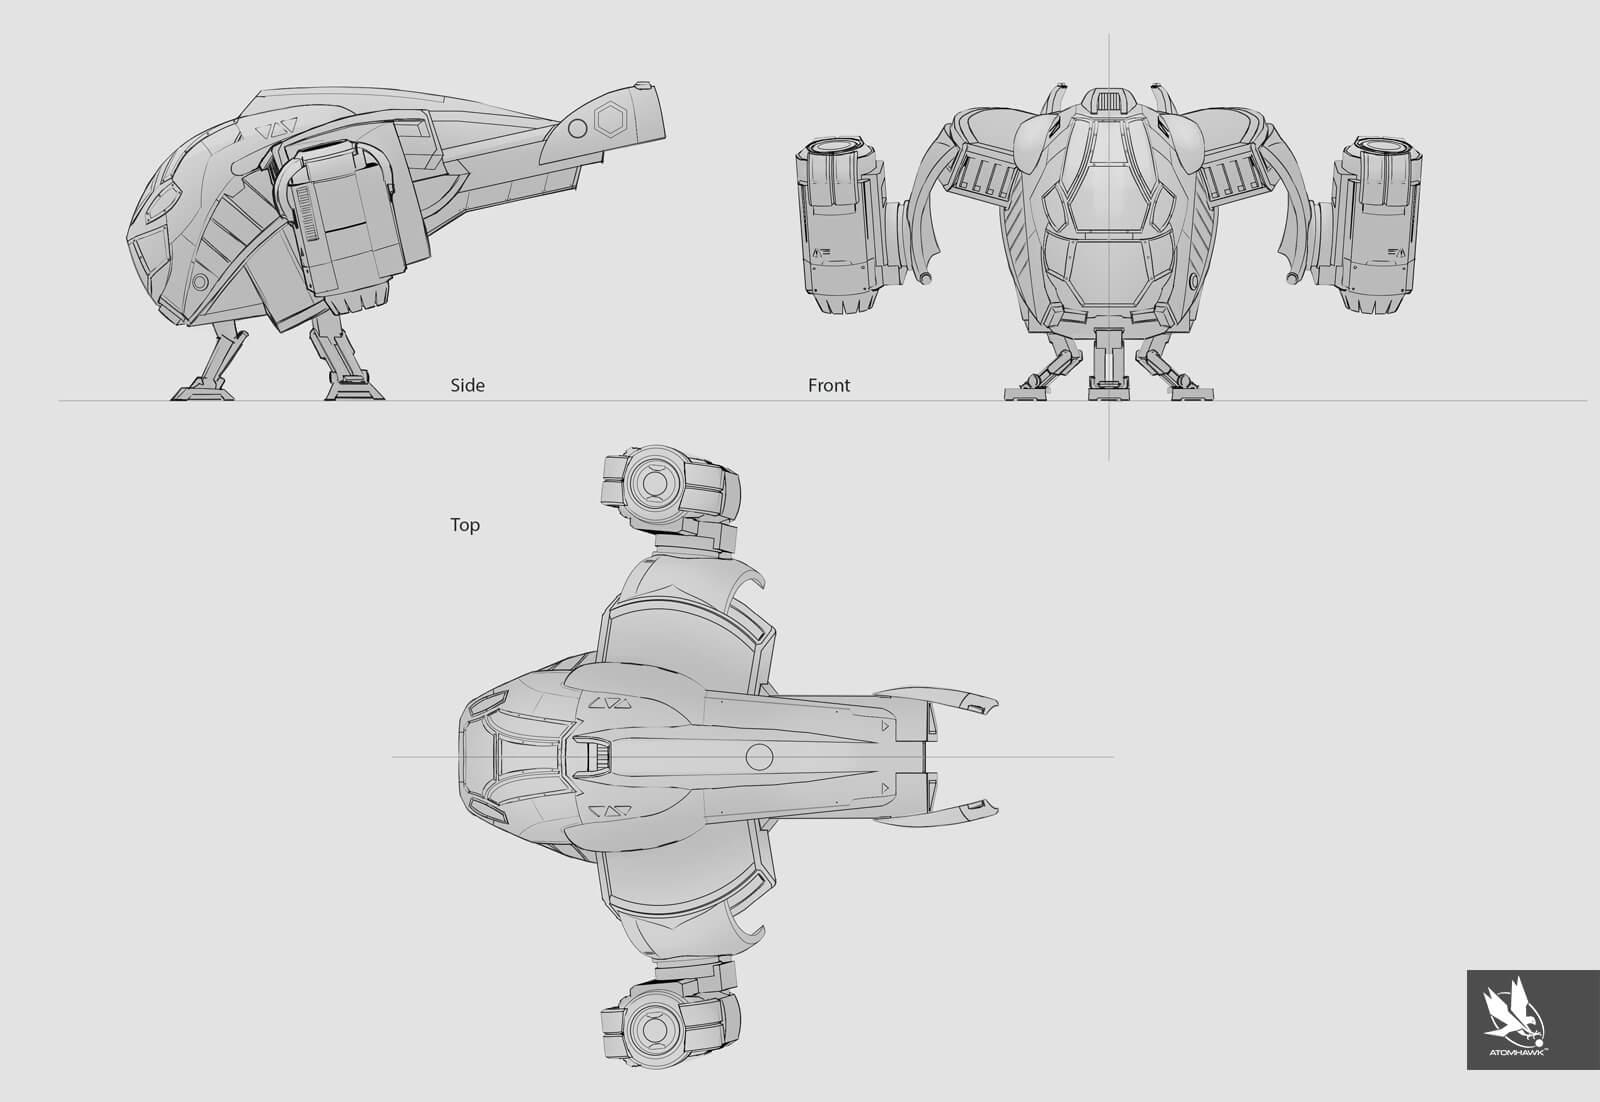 Atomhawk Concept Art - Unity 3D Kit